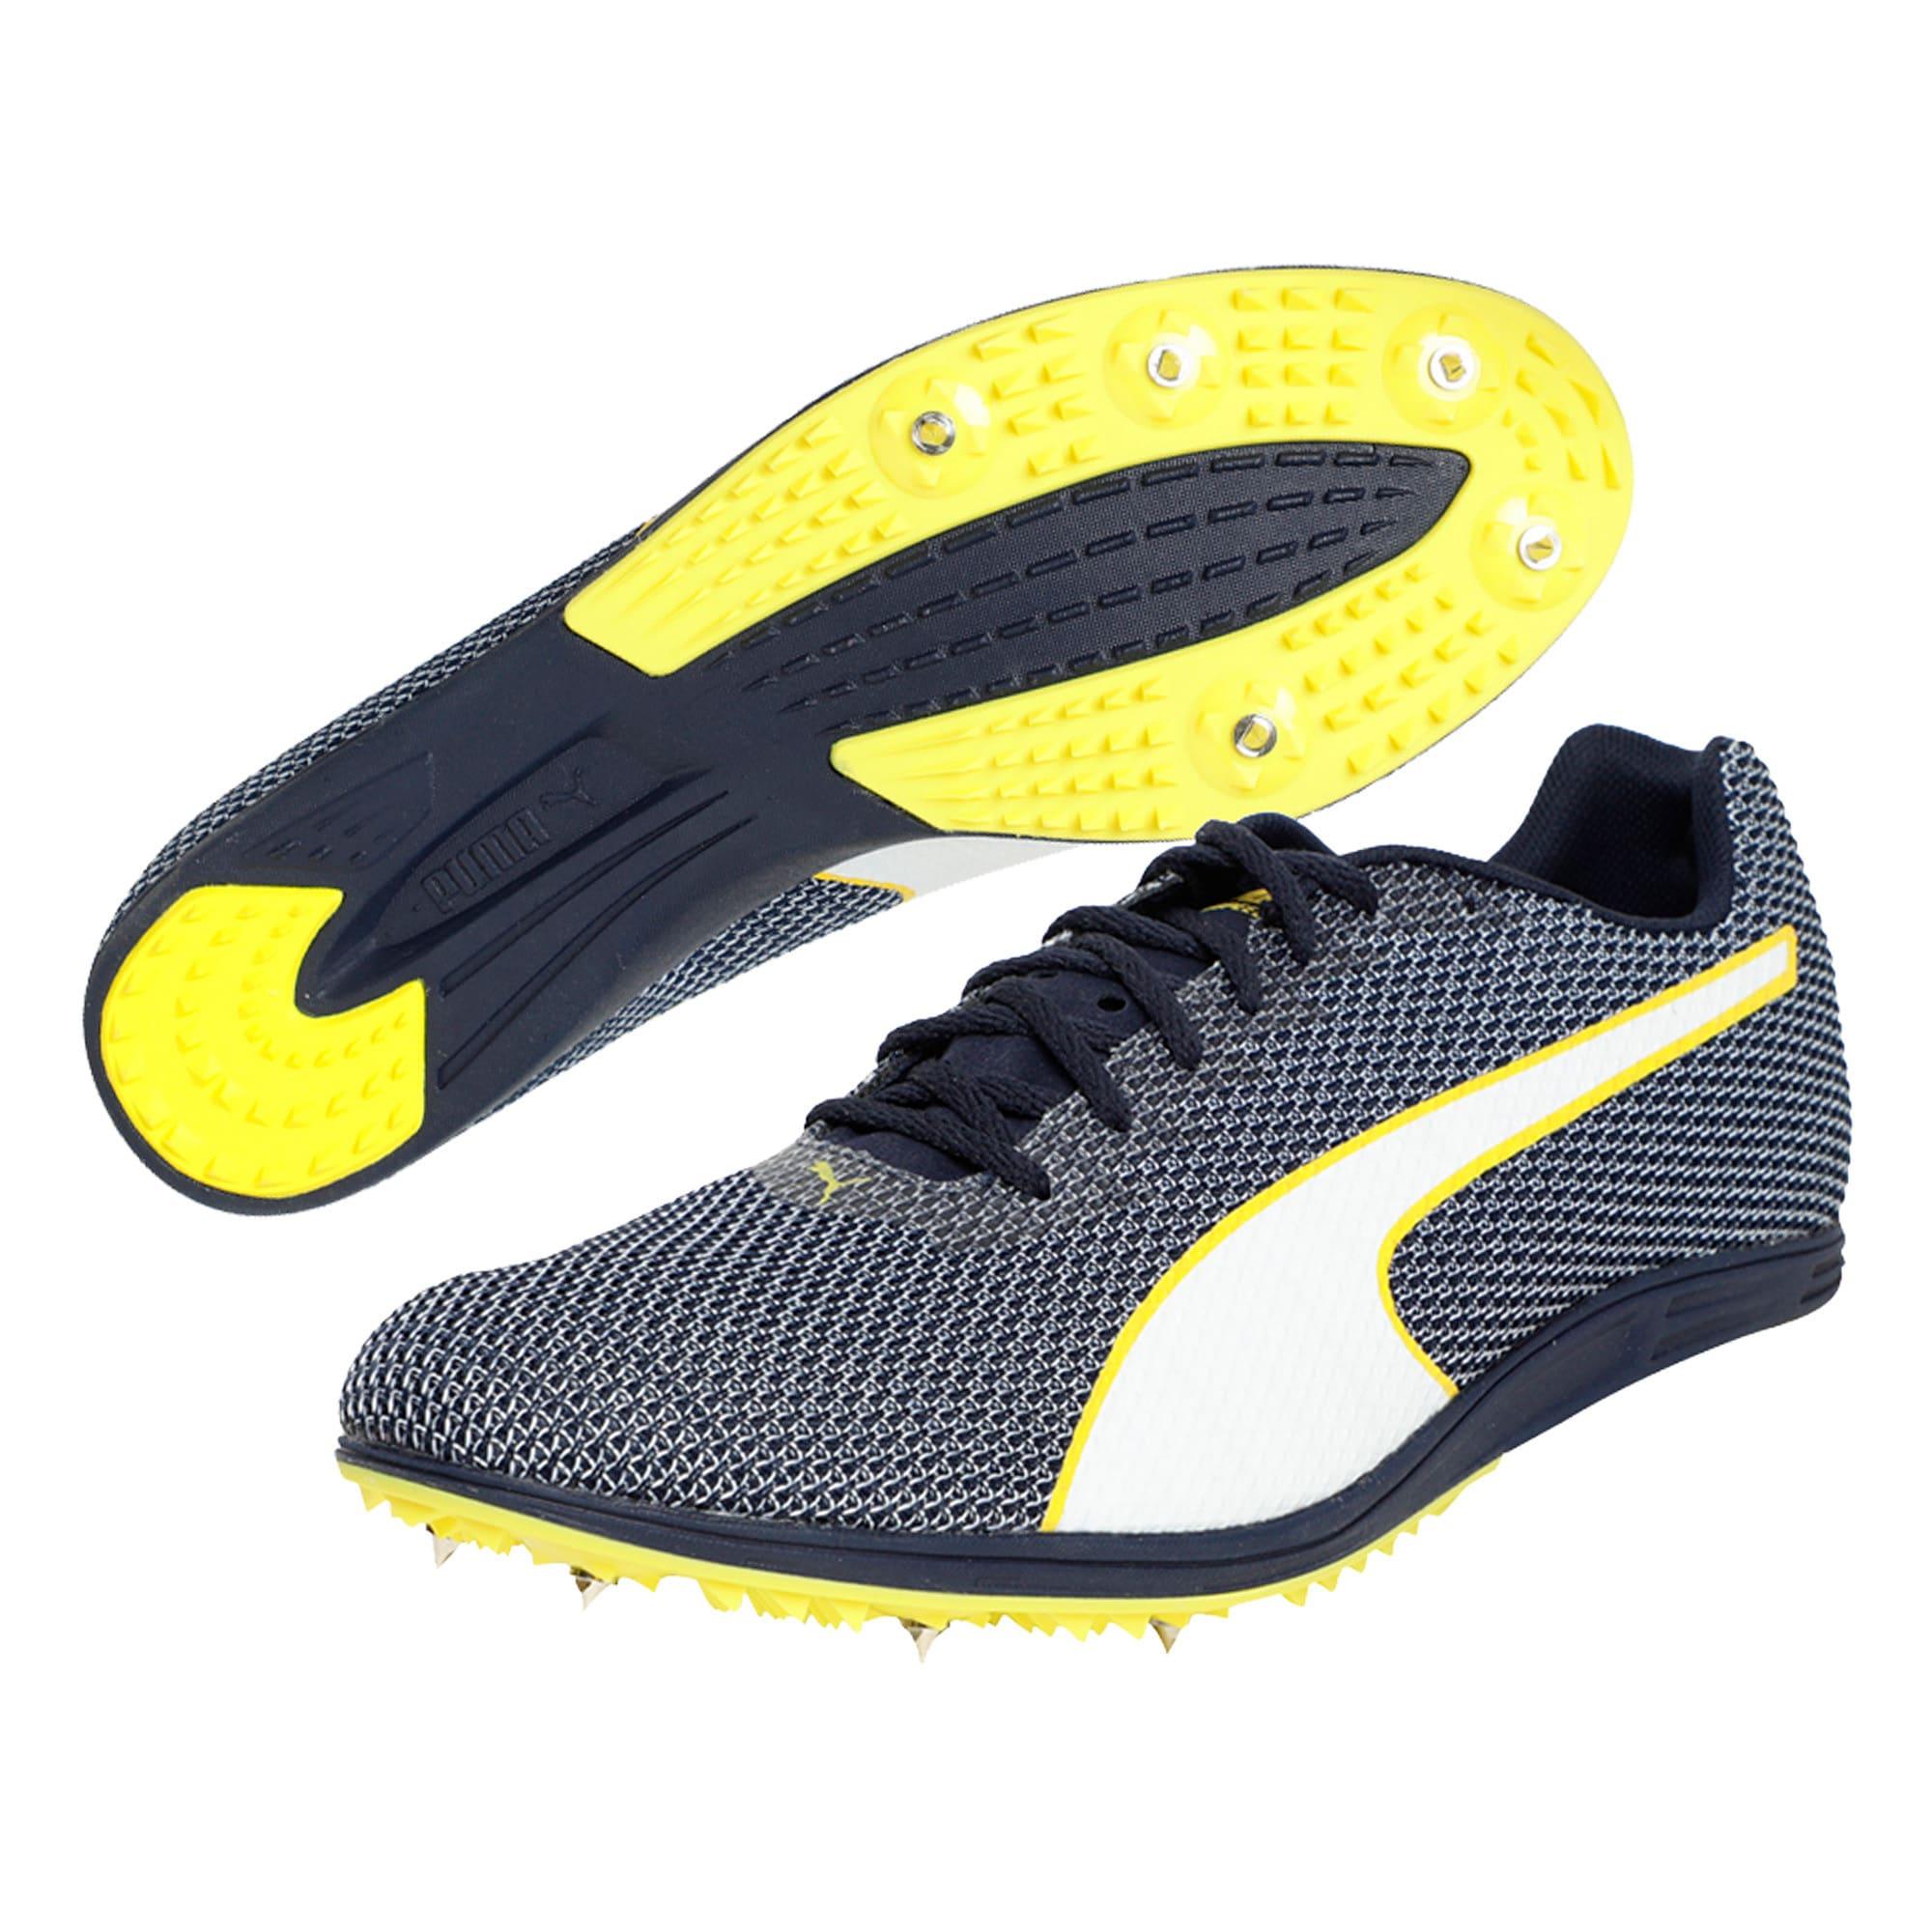 Thumbnail 2 of evoSPEED Distance 8 Men's Running Shoes, Peacoat-Blazing Yellow, medium-IND